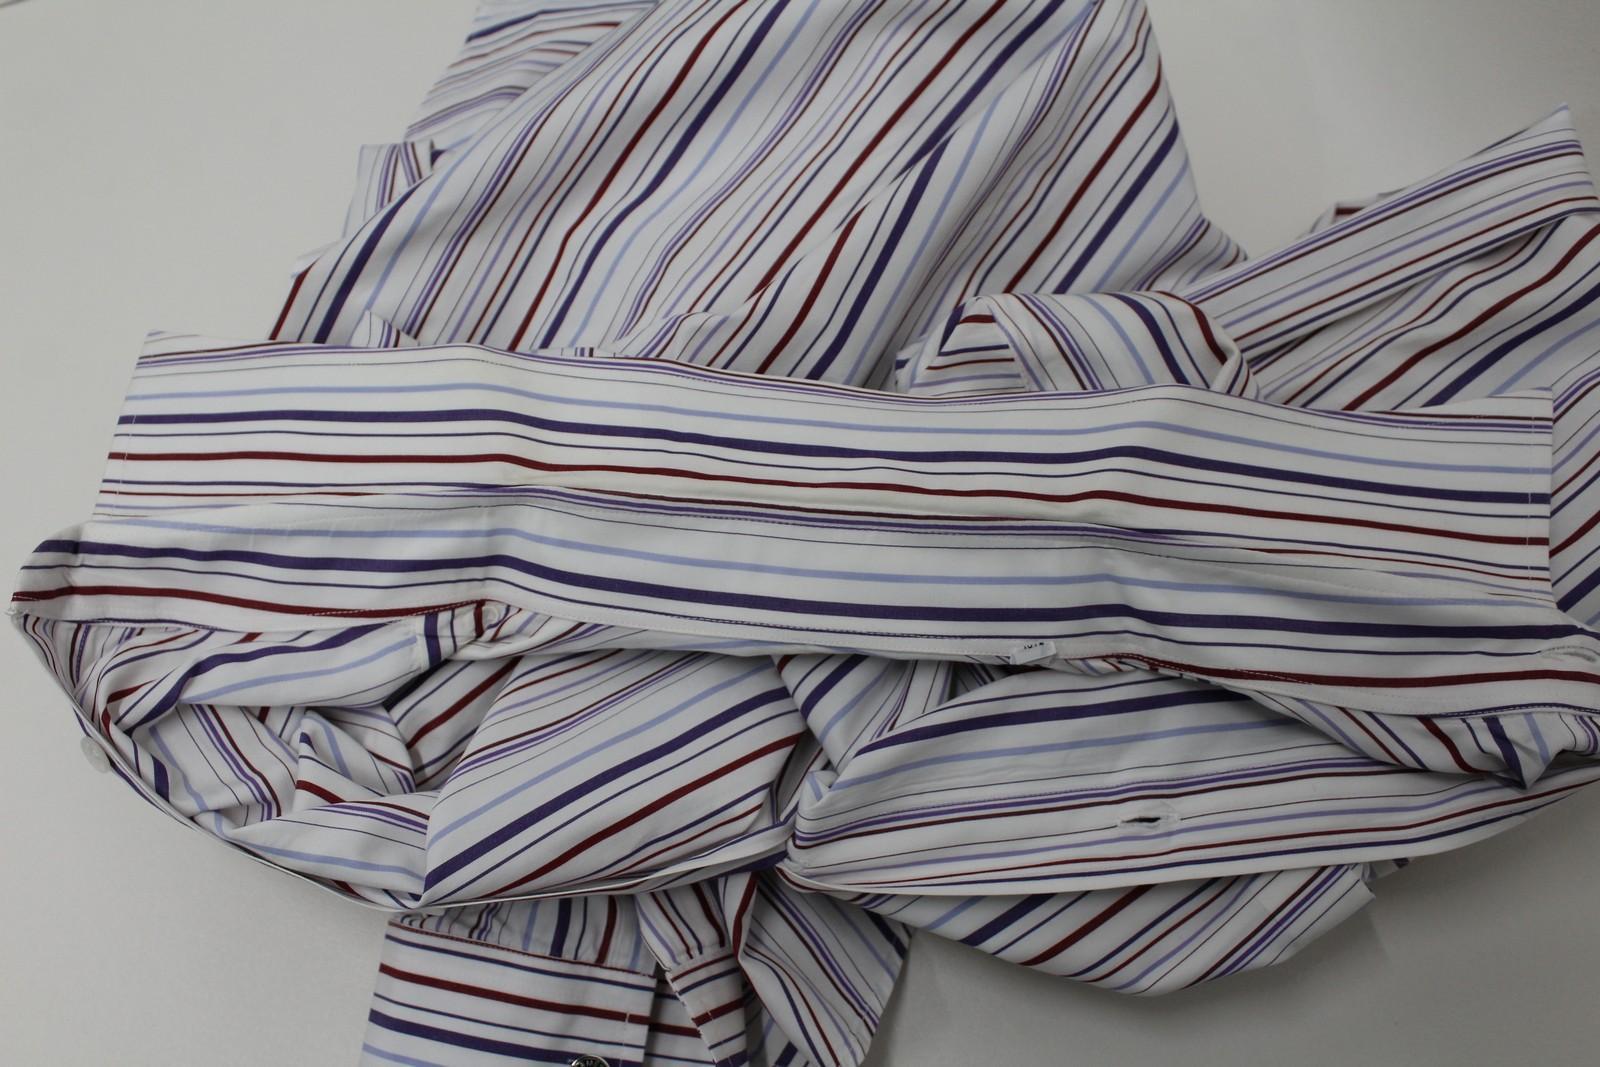 Hermes-para-hombre-Multi-Color-a-rayas-de-algodon-camisa-de-mangas-largas-cuello-16-5-034-42cm miniatura 8